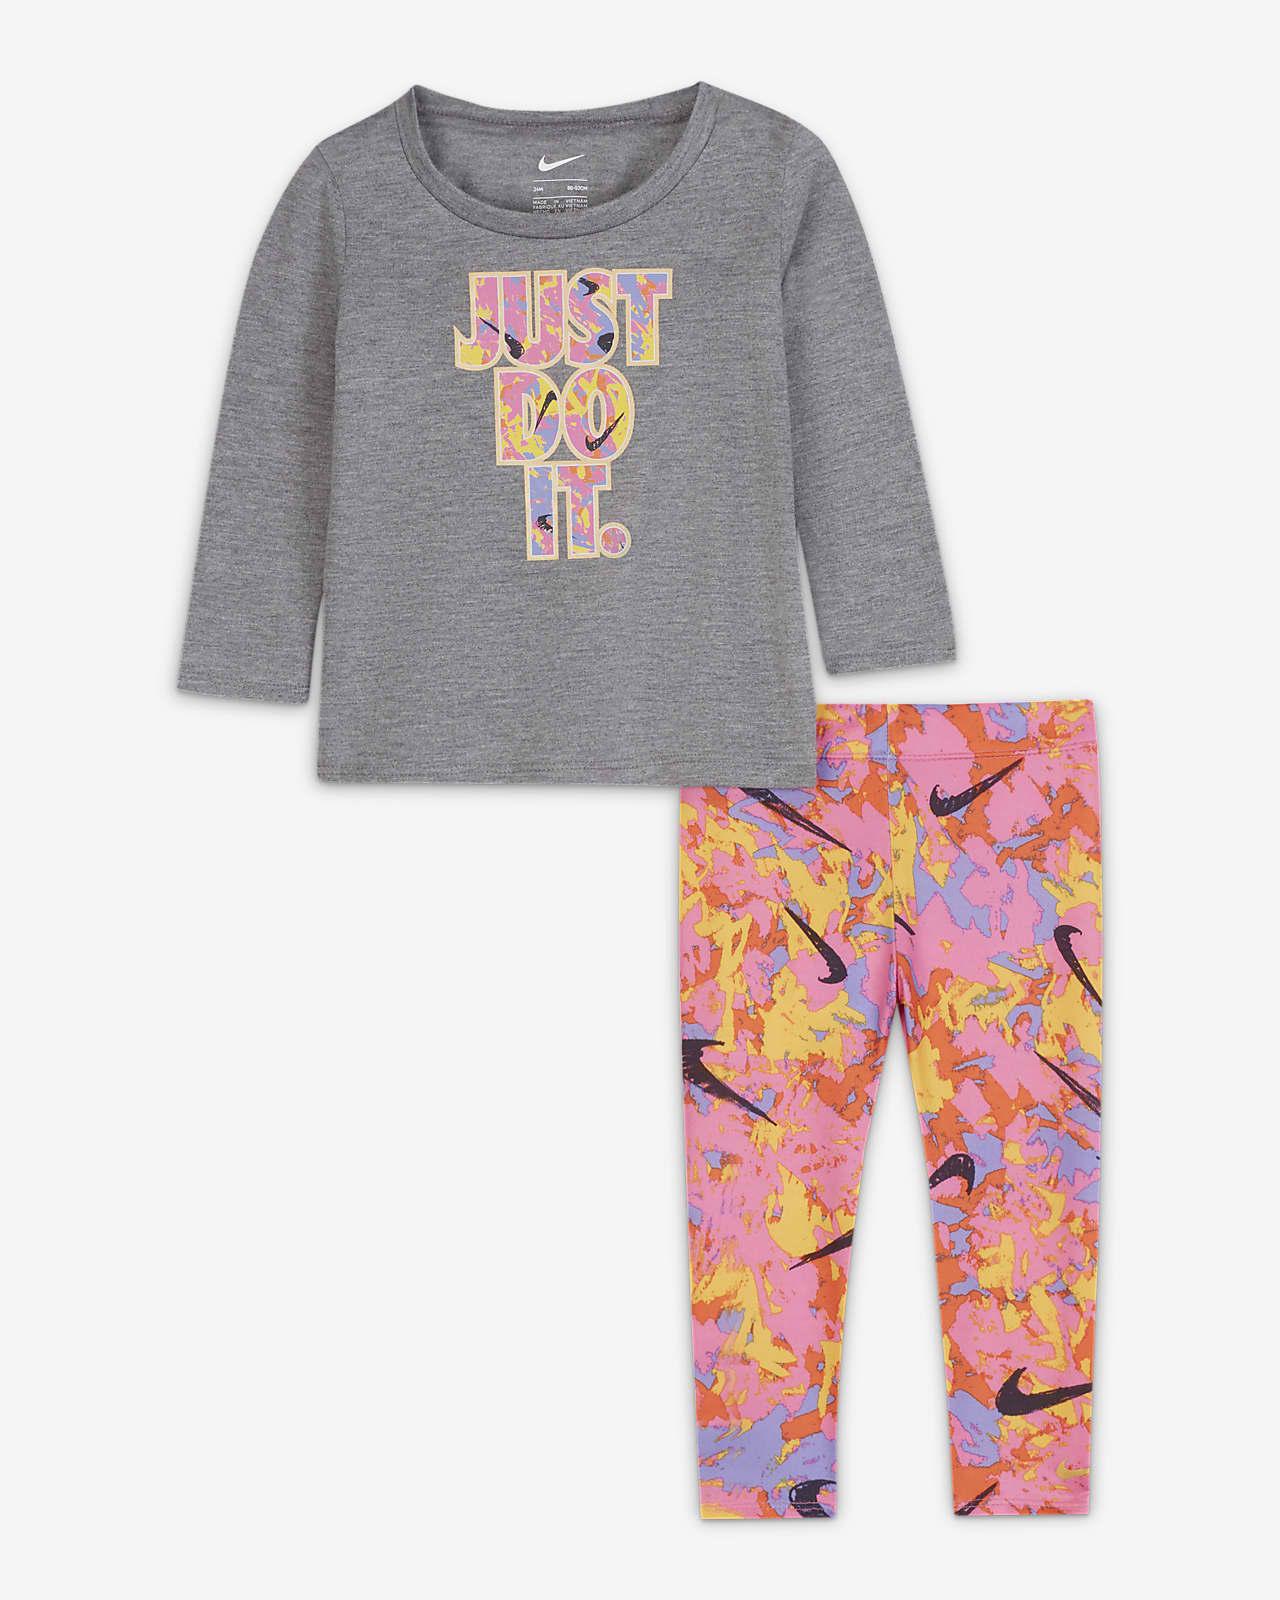 Nike Baby (12-24M) T-Shirt and Leggings Set